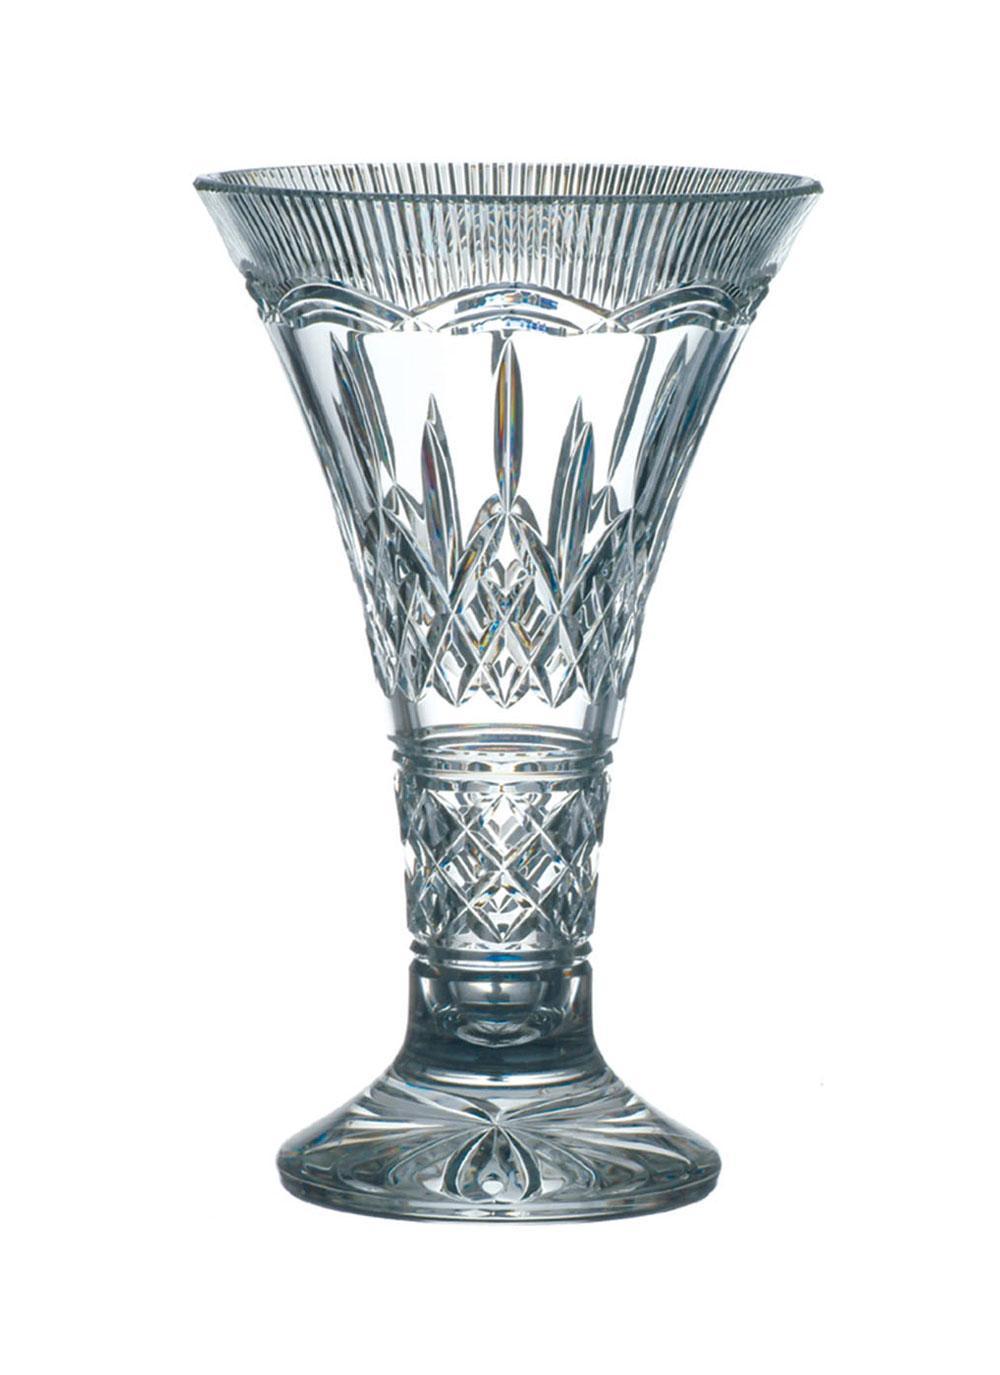 Waterford crystal lismore 14 statement vase blarney waterford crystal lismore 14 statement vase reviewsmspy